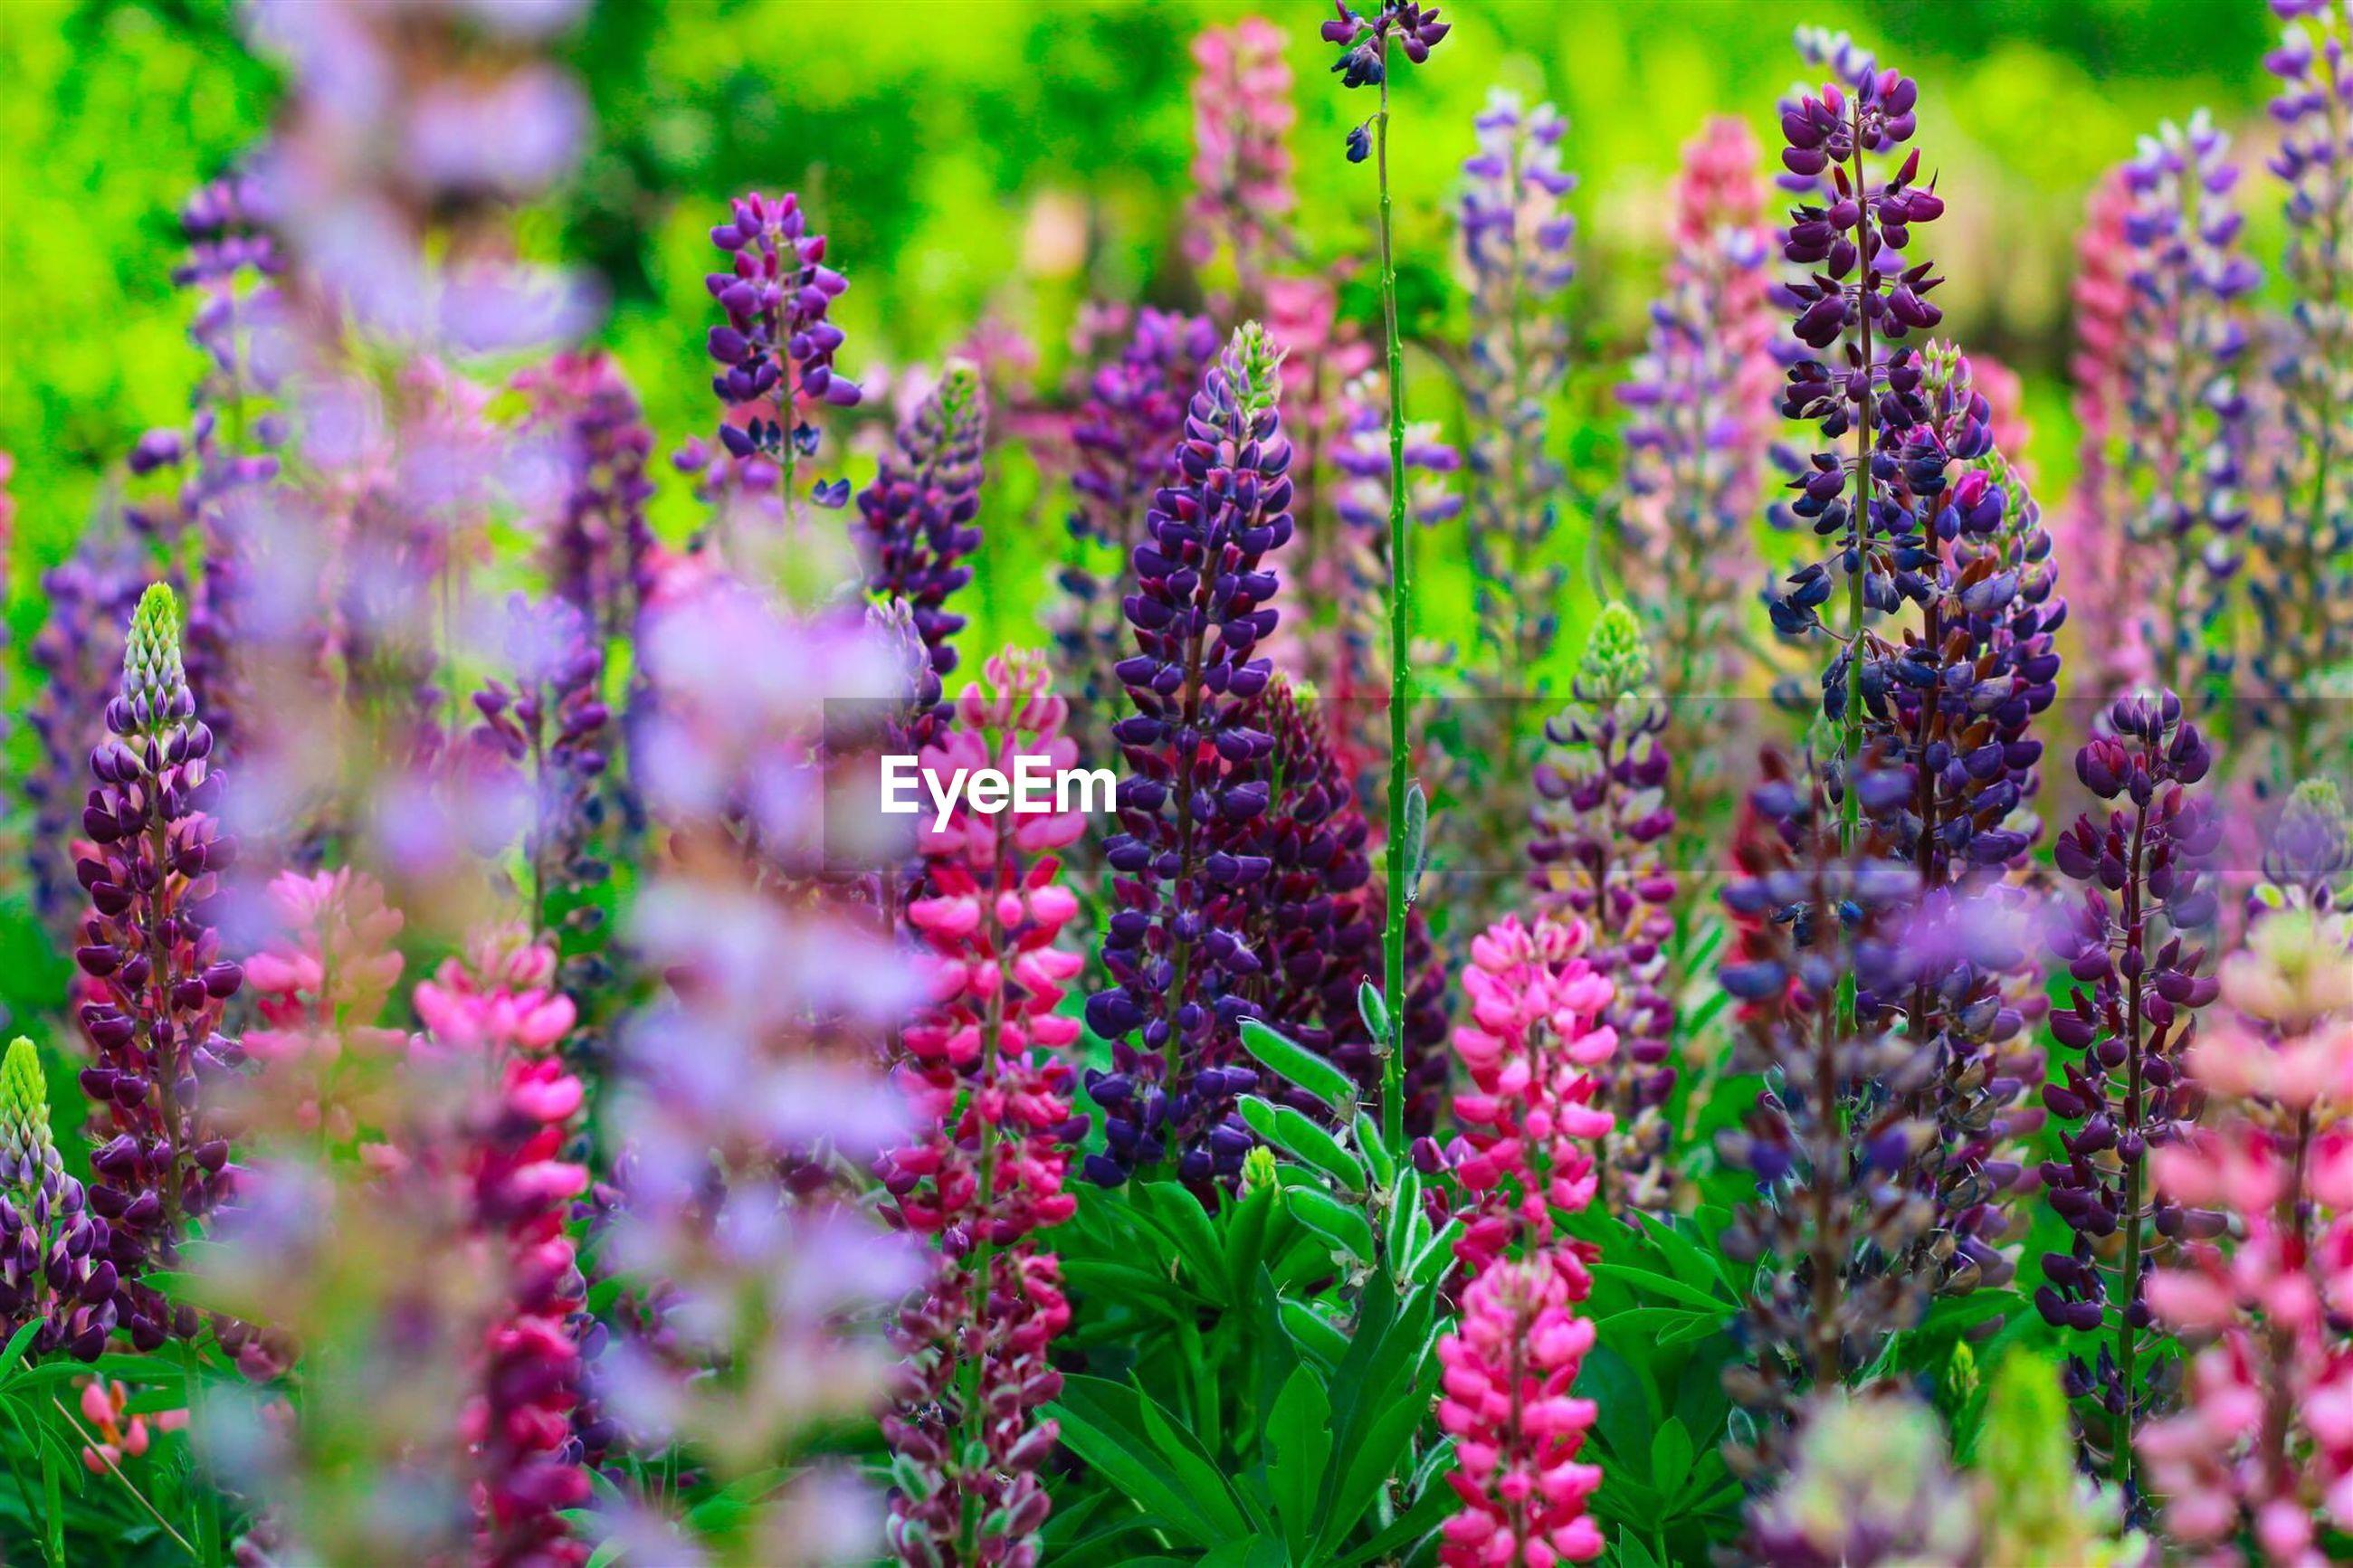 Lupine flowers in the field